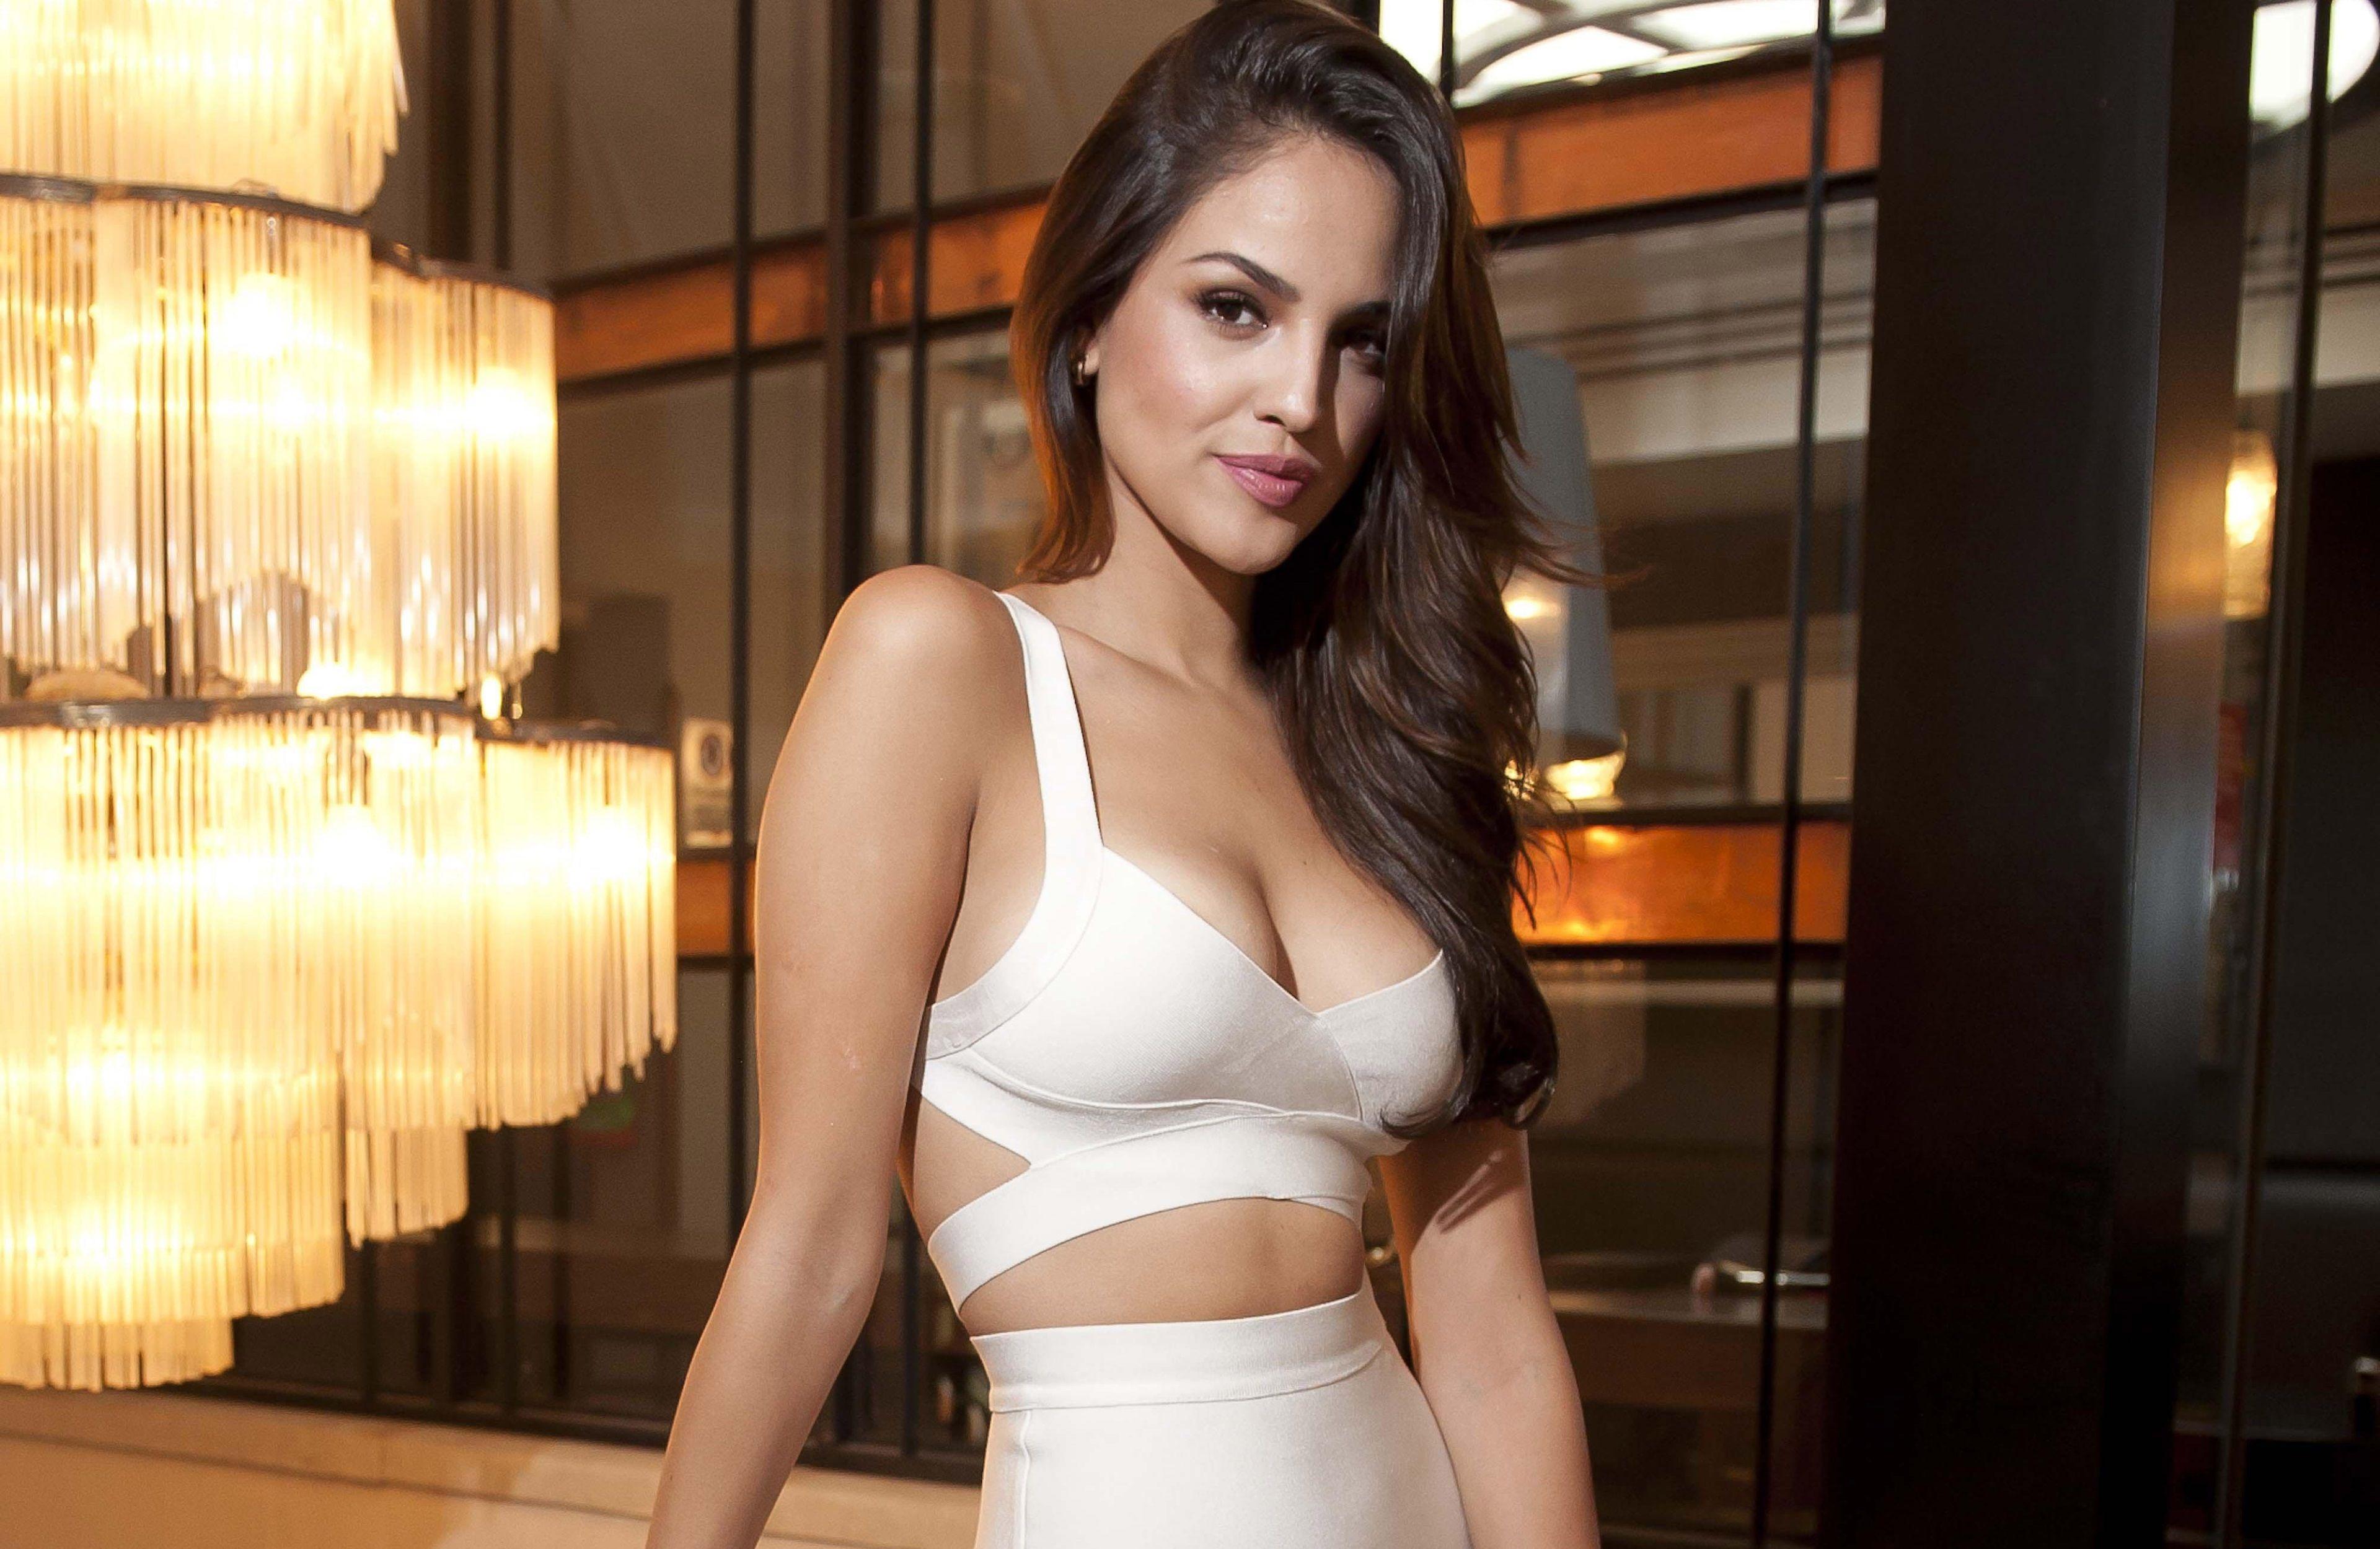 3840x2500 Eiza Gonzalez 4k Amazing Wallpaper Hd Eiza Gonzalez Mexican Actress Brunette